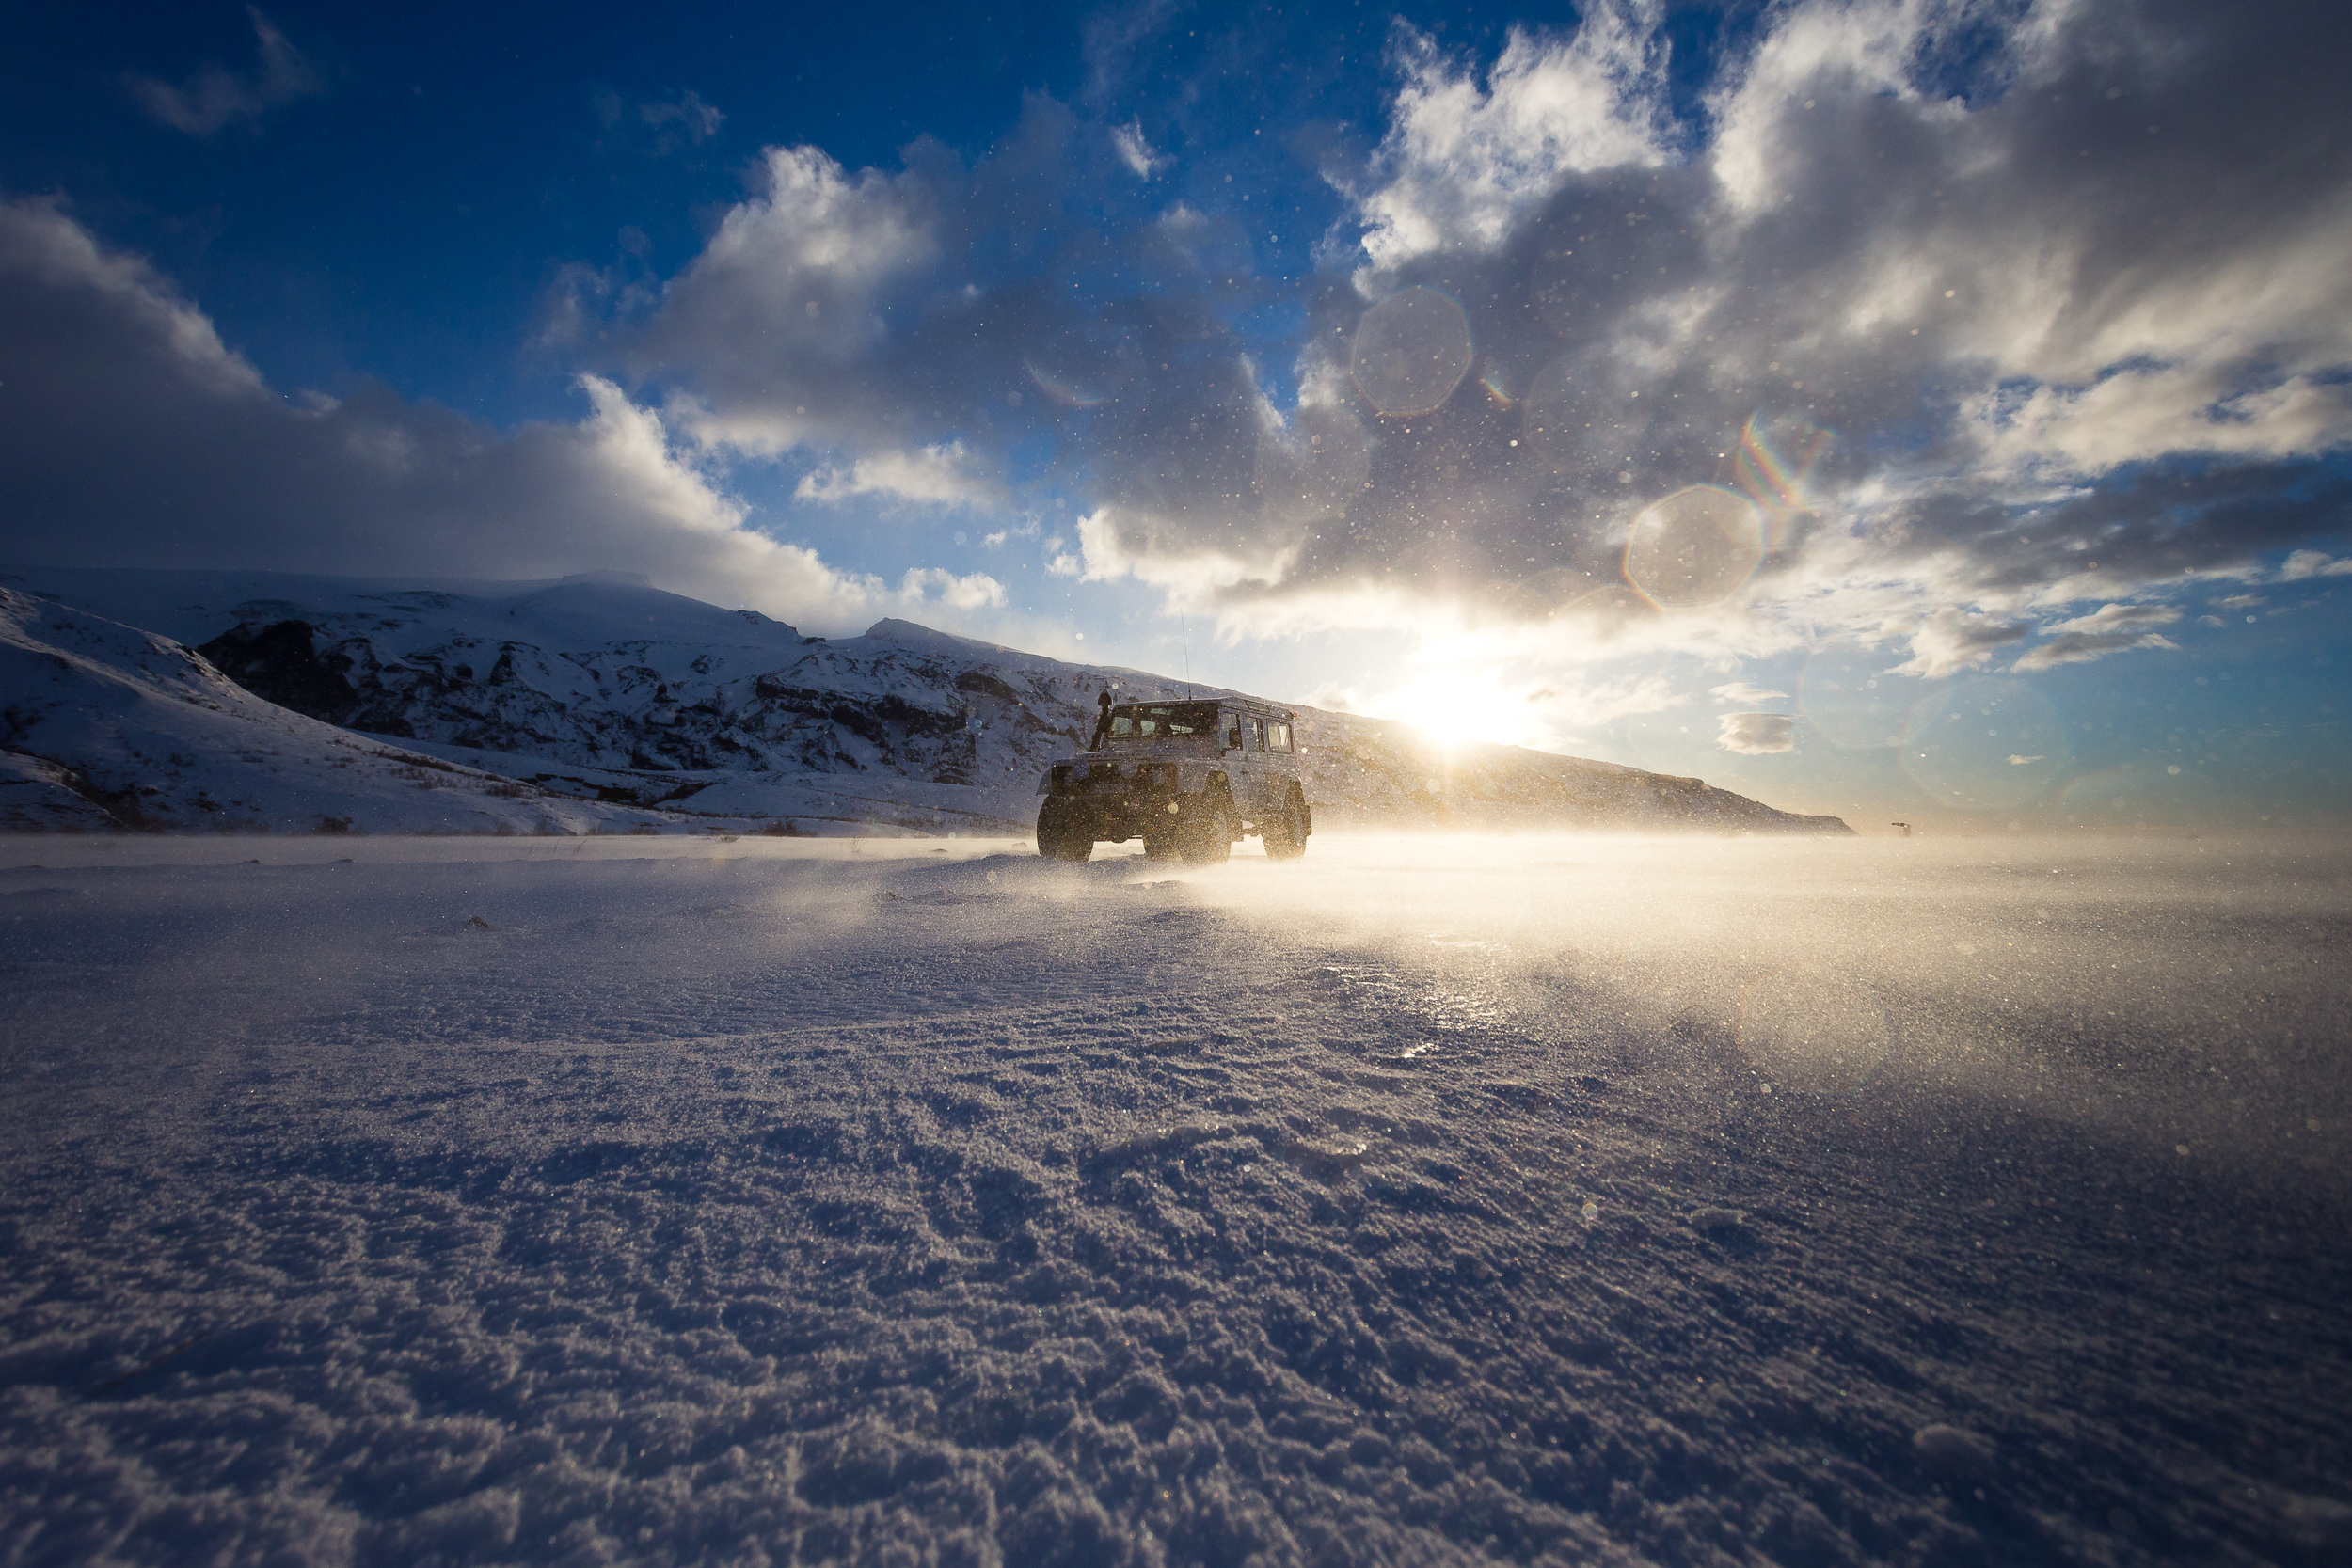 isak-4x4-thorsmork-winter.jpg